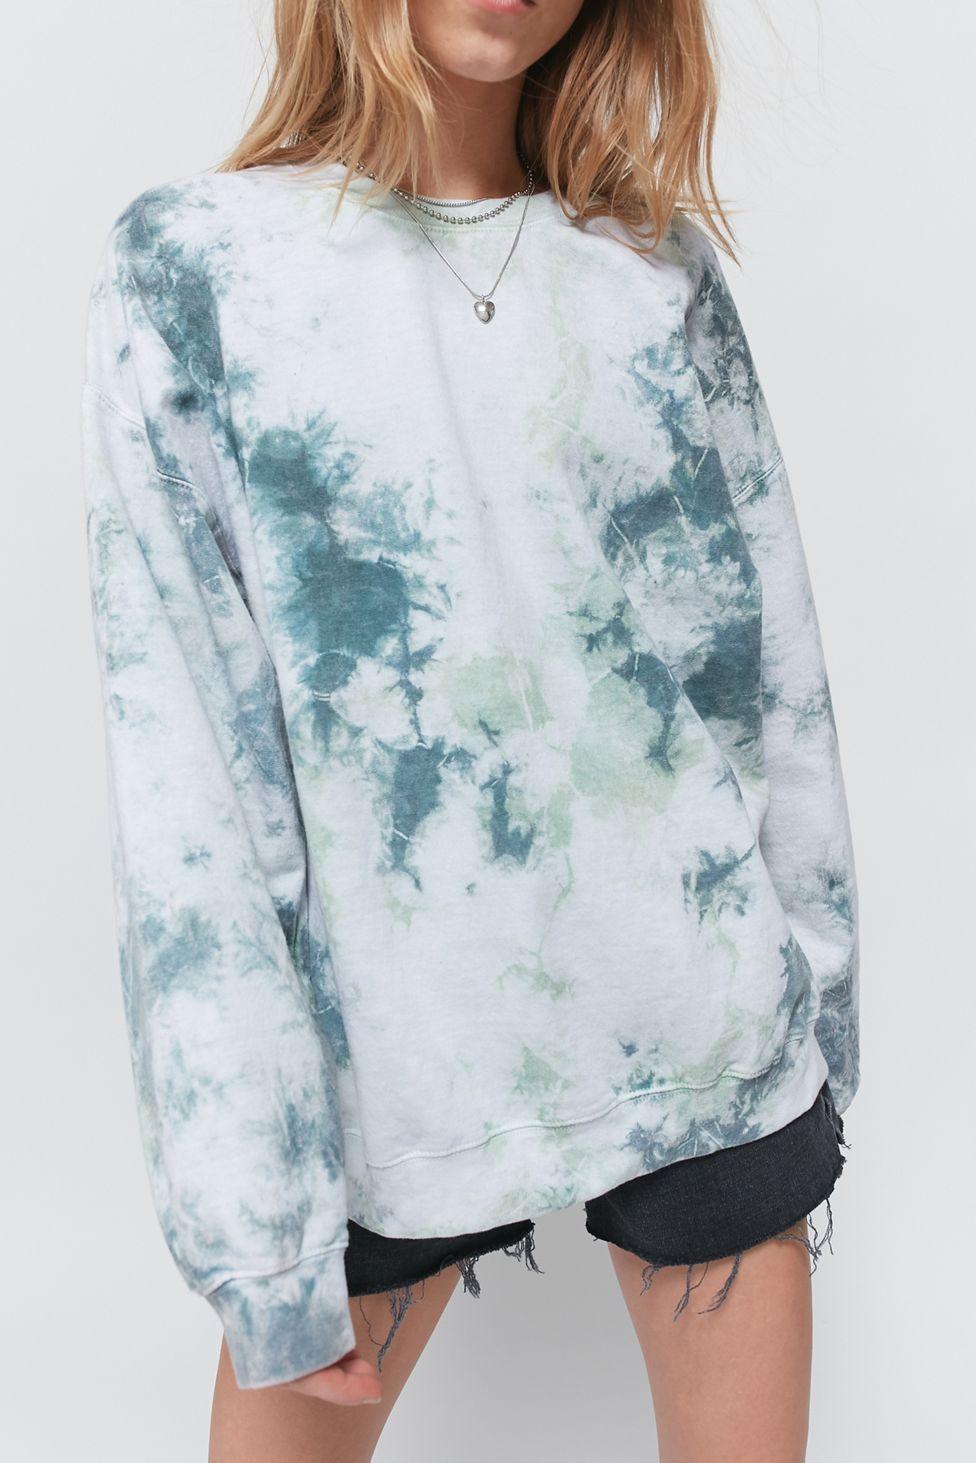 Urban Renewal Recycled Tie Dye Crew Neck Sweatshirt In 2021 Tie Dye Outfits Tie Dye Shirts Tie Dye Hoodie [ 1463 x 976 Pixel ]